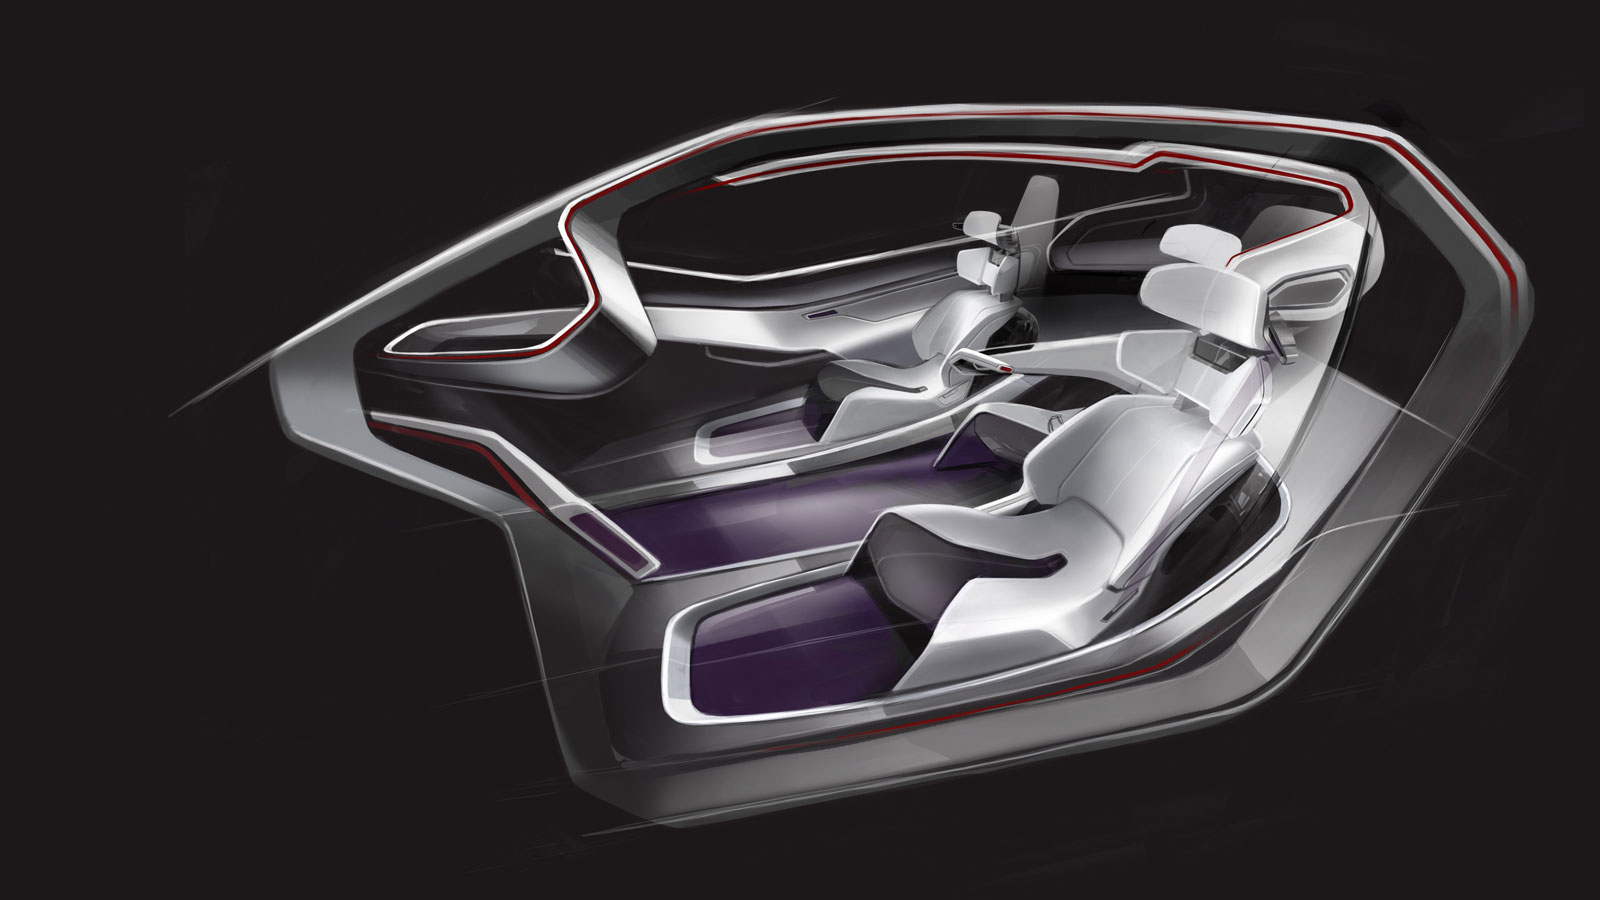 volkswagen trimaran concept interior car body design. Black Bedroom Furniture Sets. Home Design Ideas